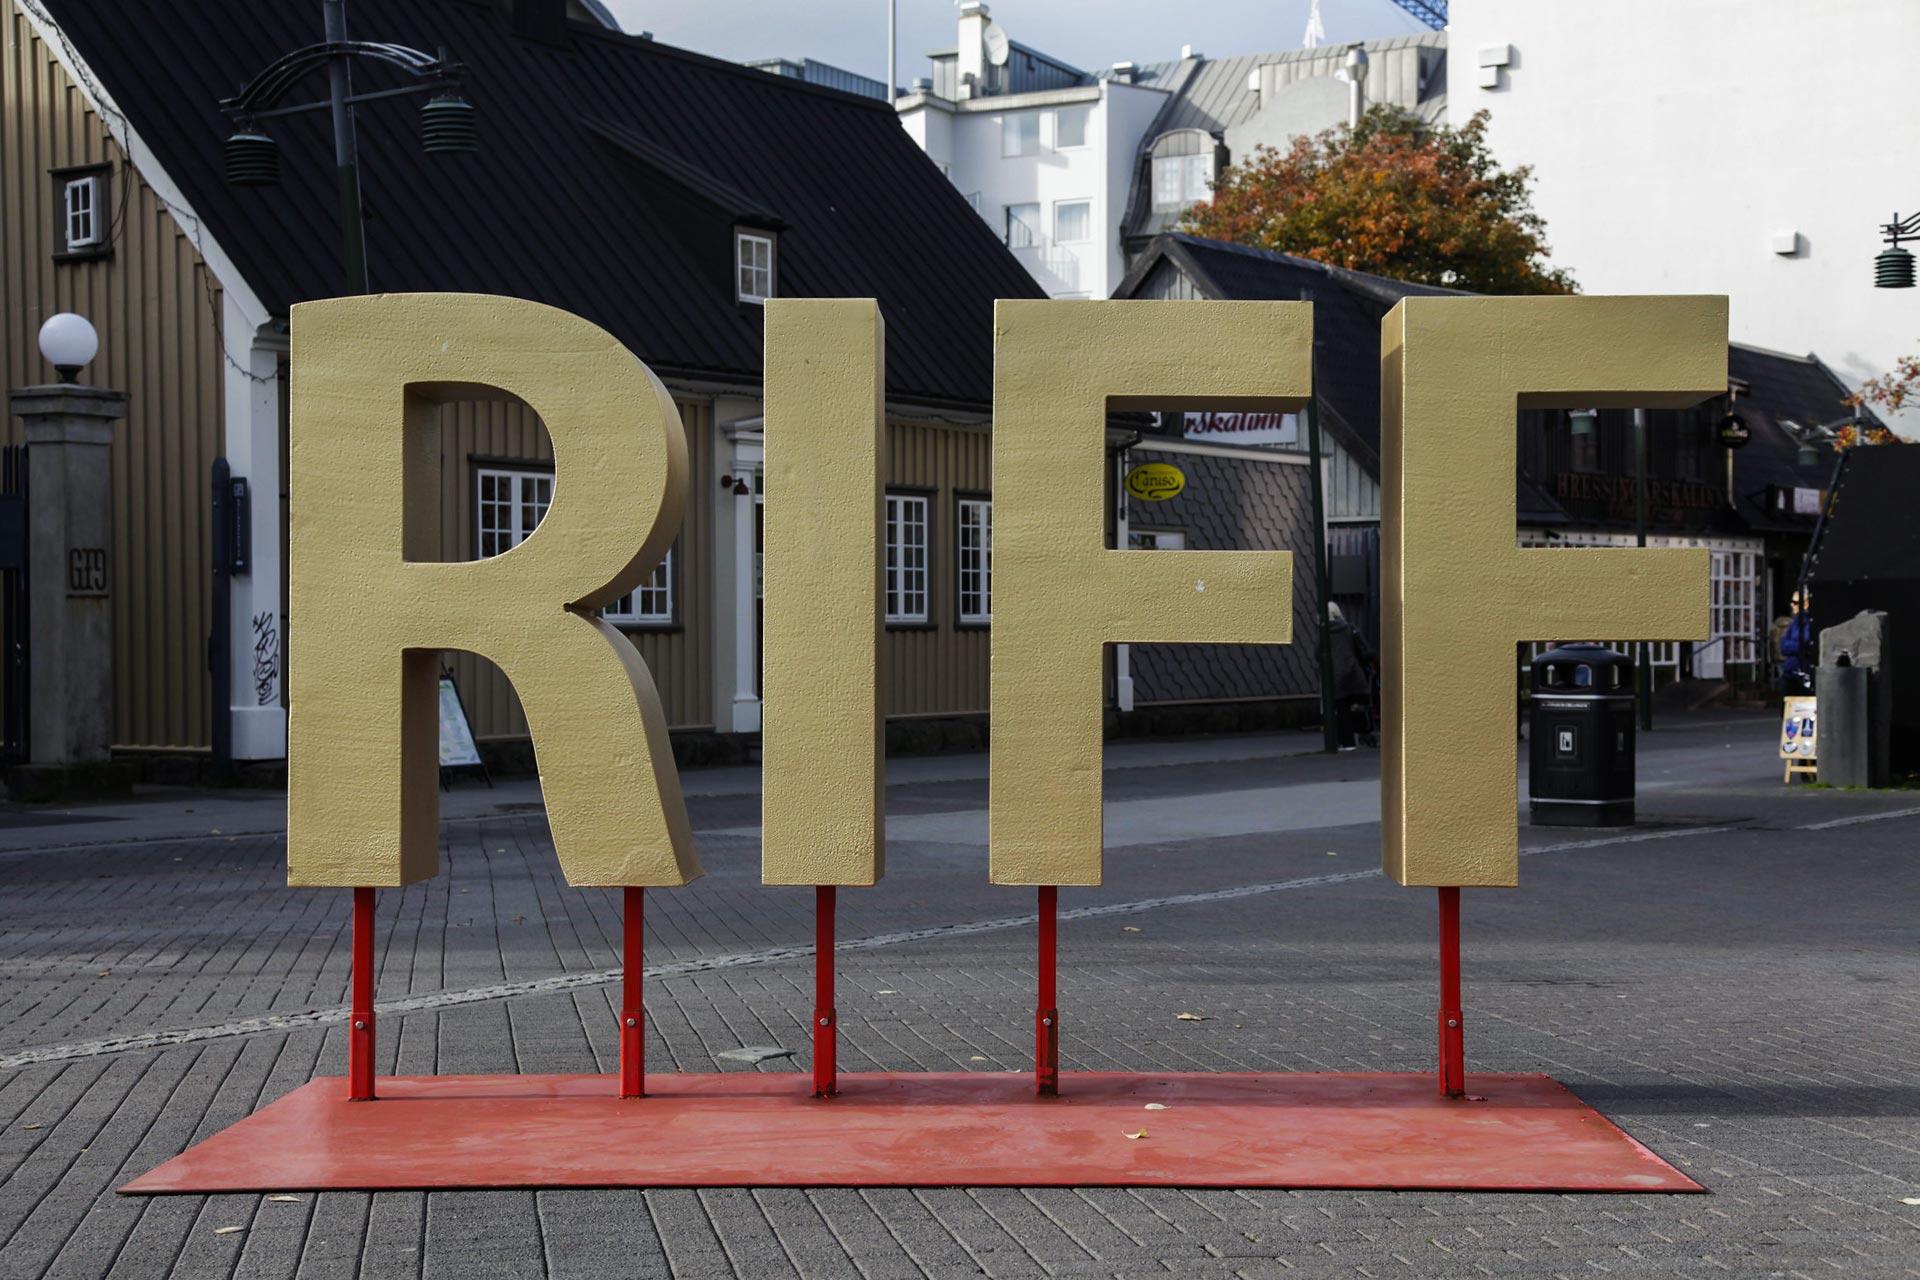 RIFF 2020 hlýtur Media styrk Evrópusambandsins